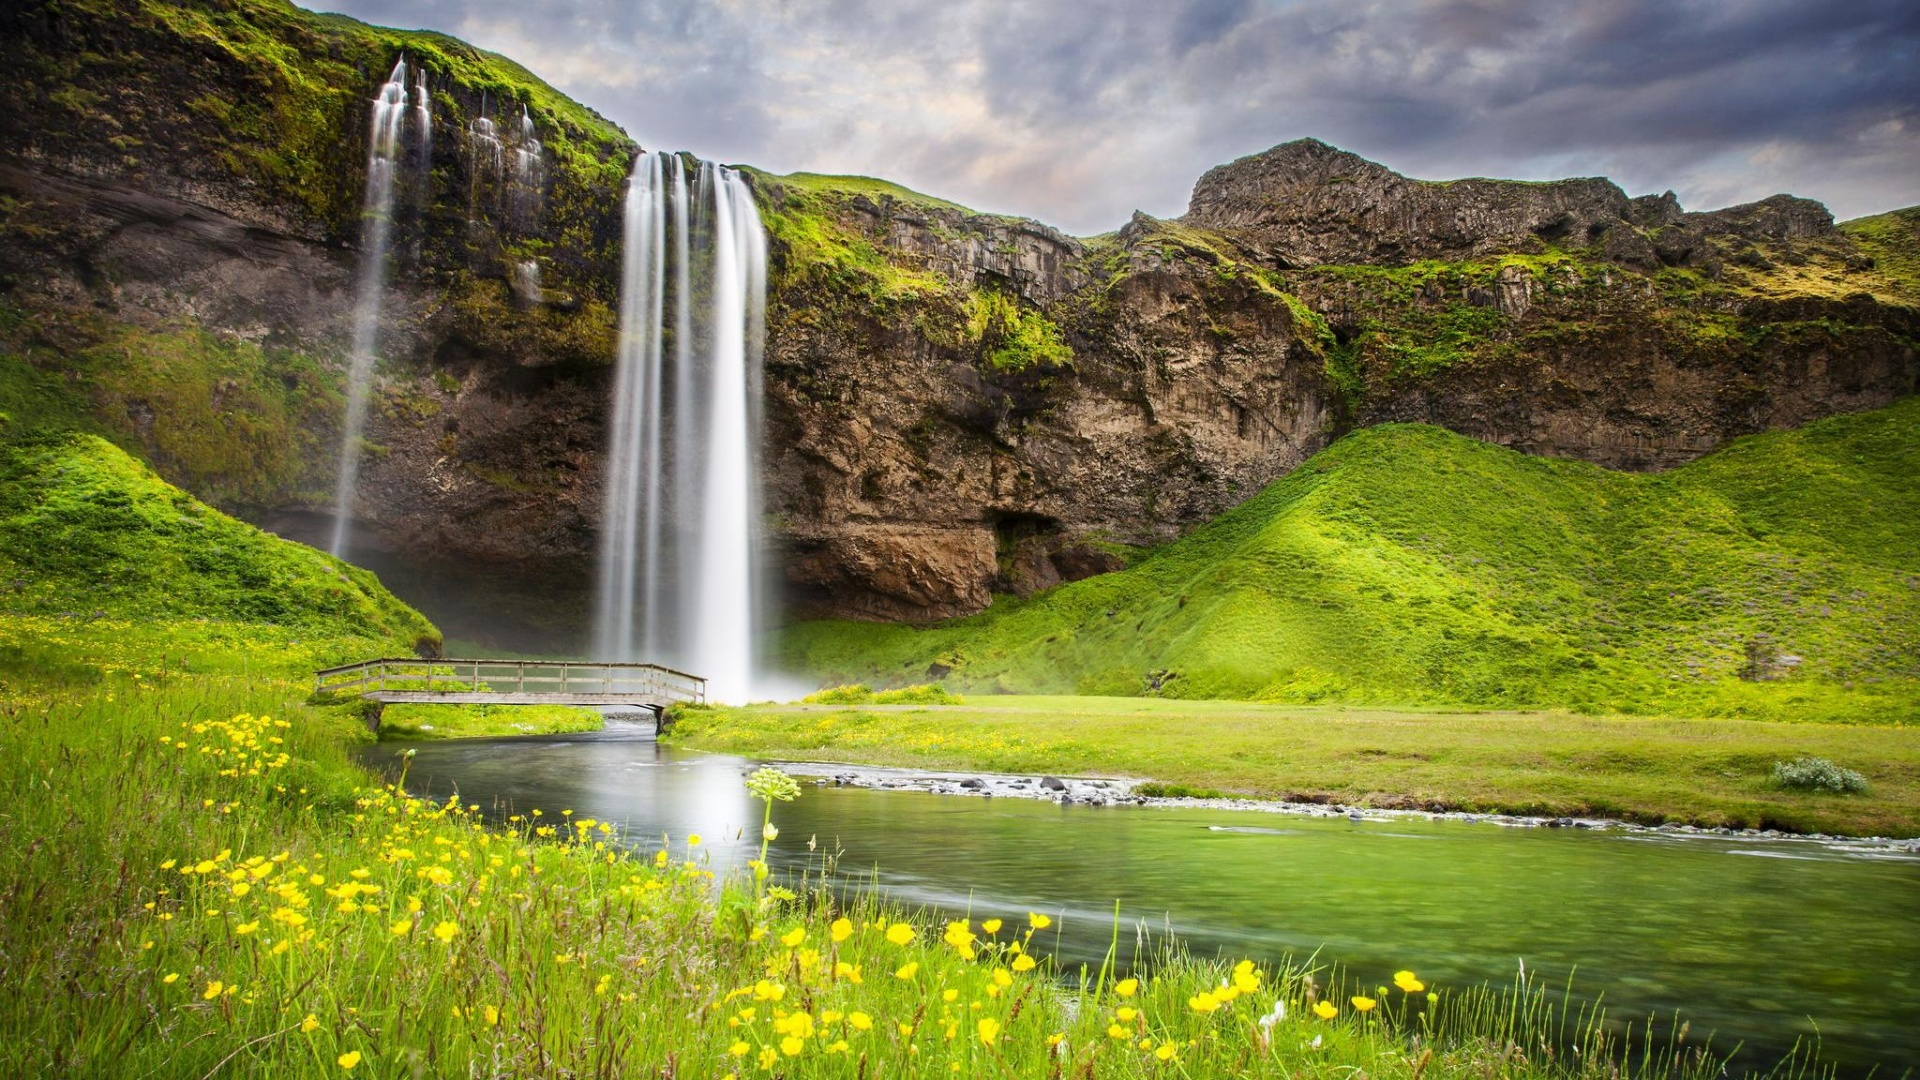 download Waterfall River Summer Landscape 1920 x 1080 1920x1080